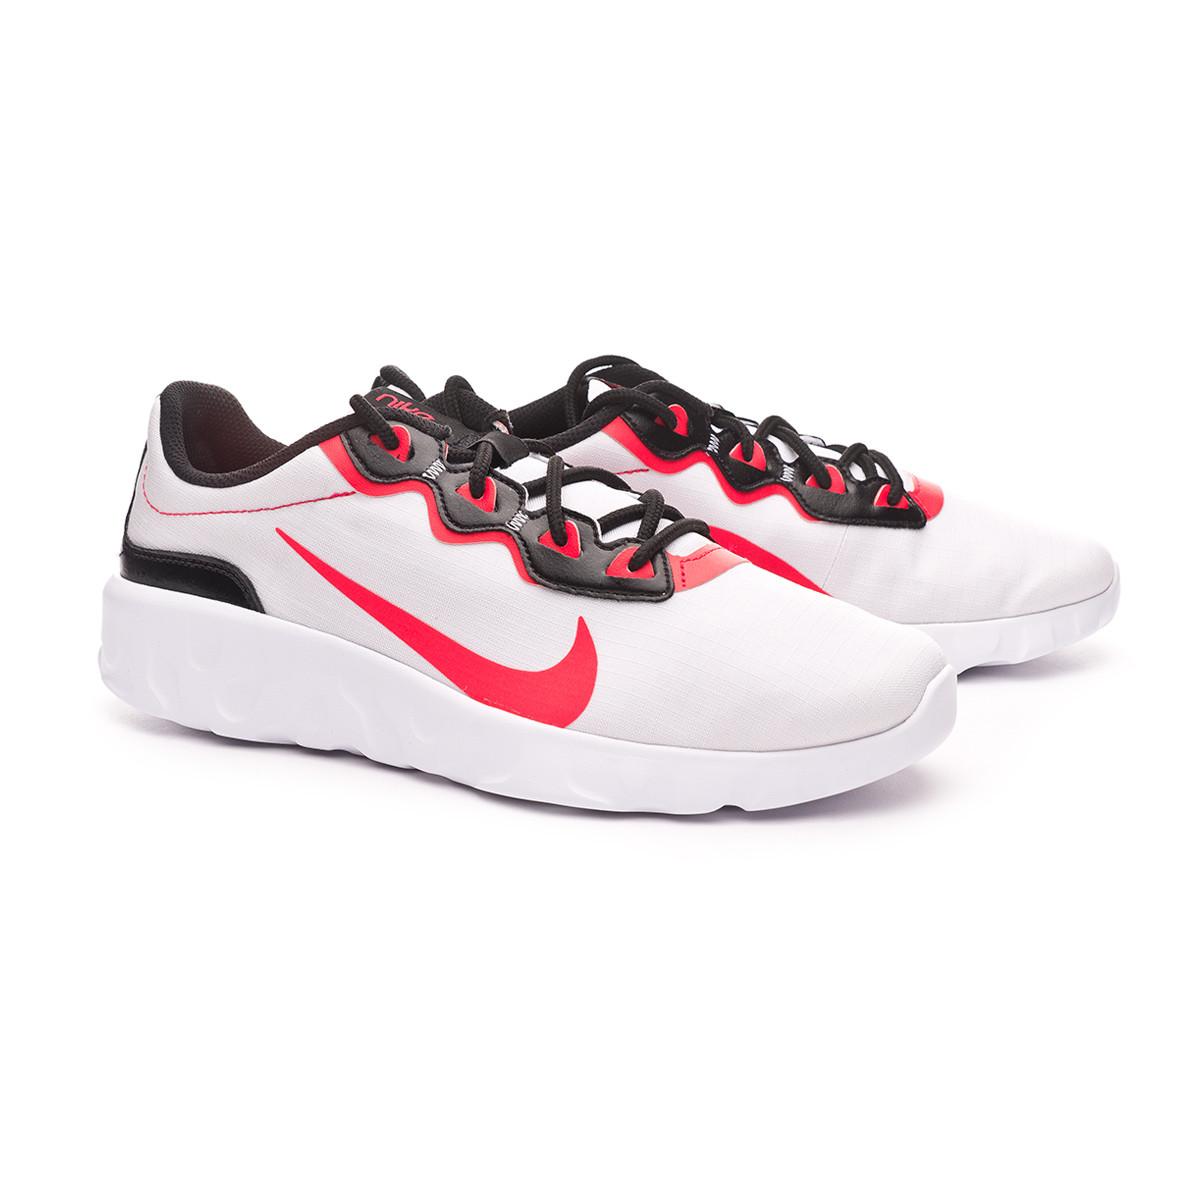 Scarpe Nike Explore Strada Platinum tint Red orbit Black  NmXeuw